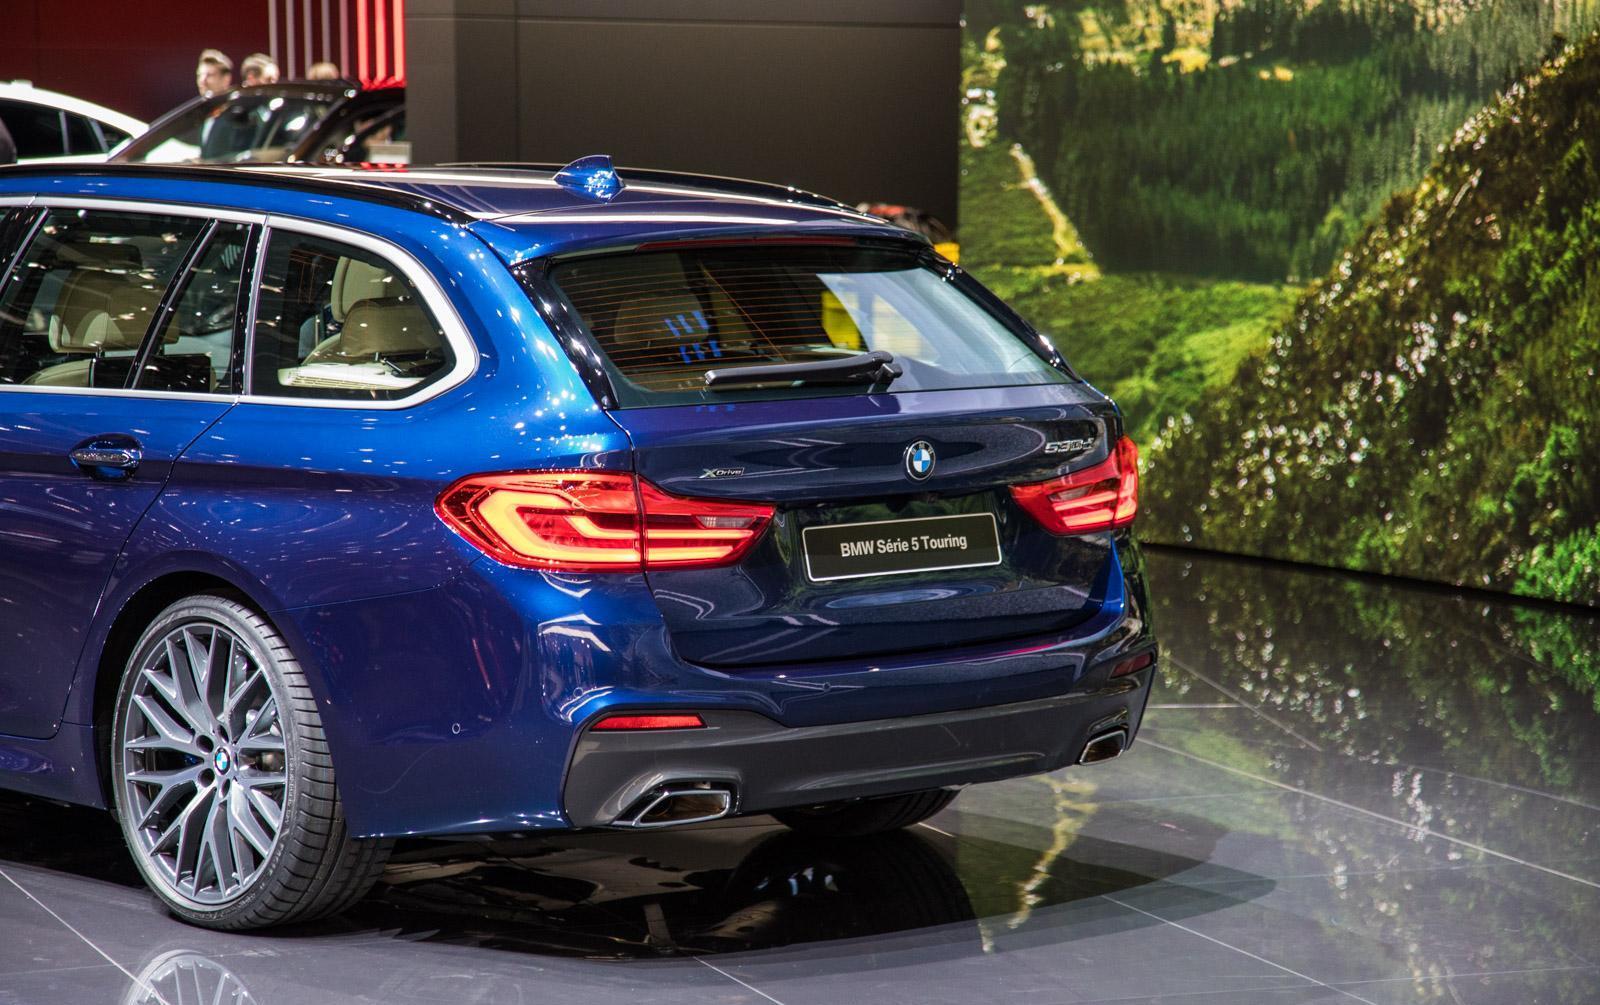 BMW-5-serie-touring-006